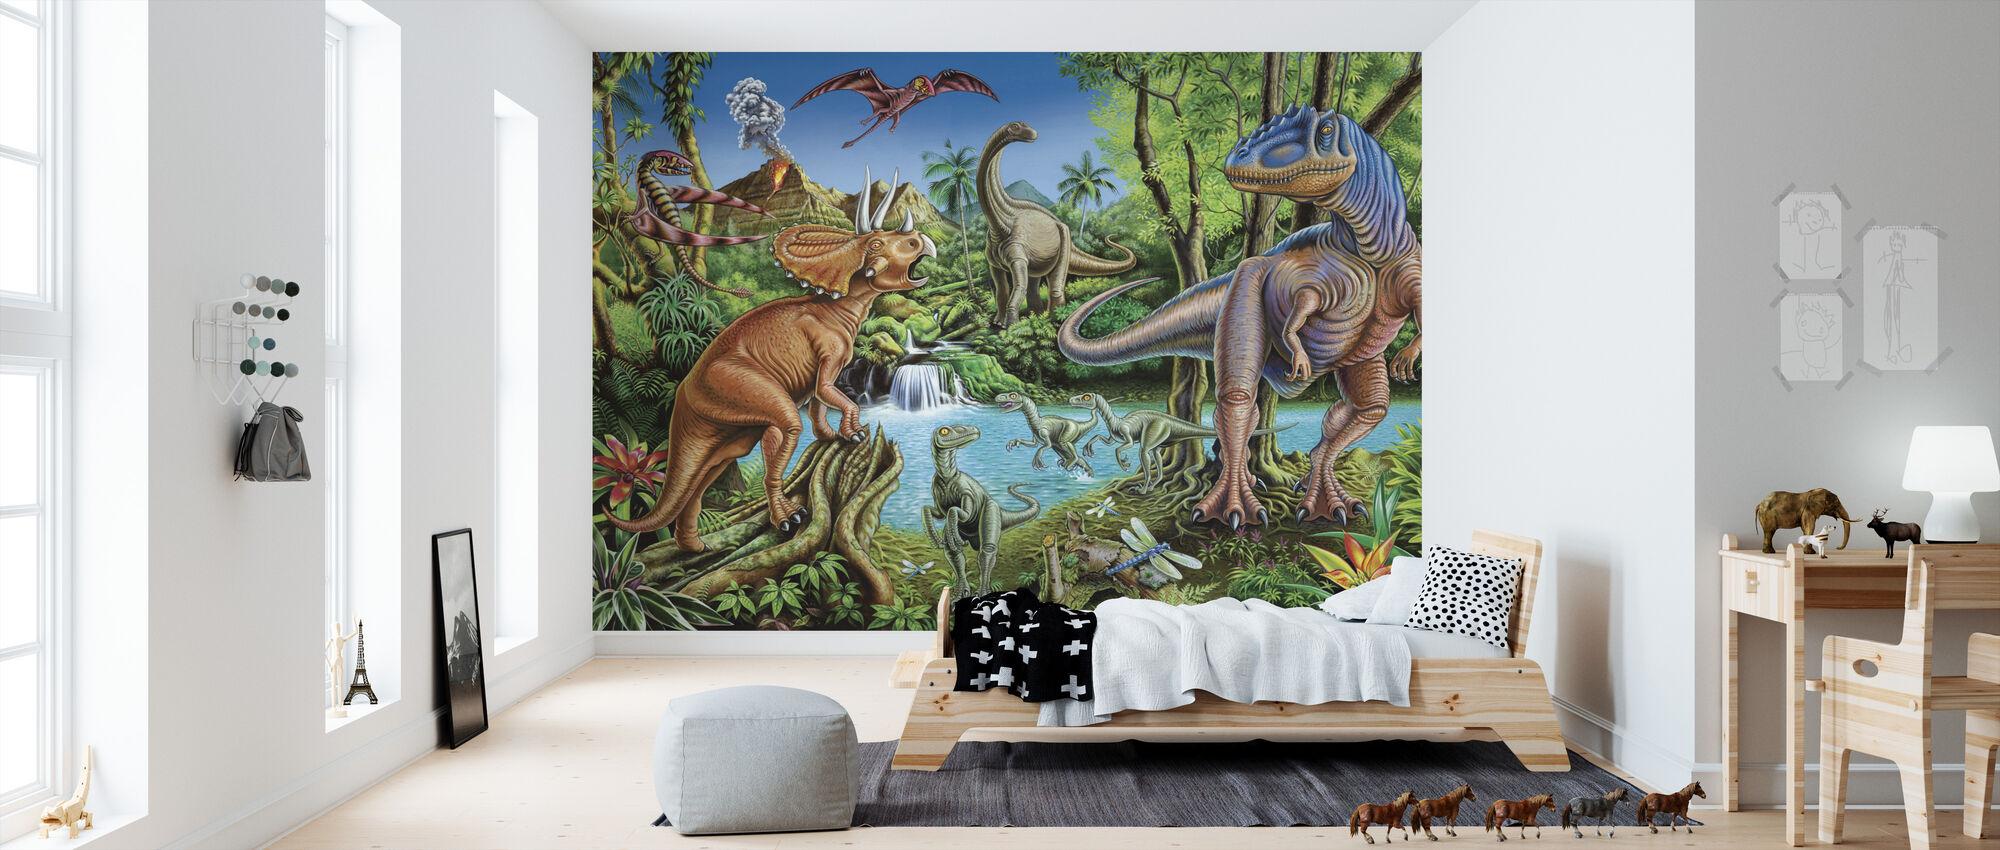 Dinosauruswaterval - Behang - Kinderkamer